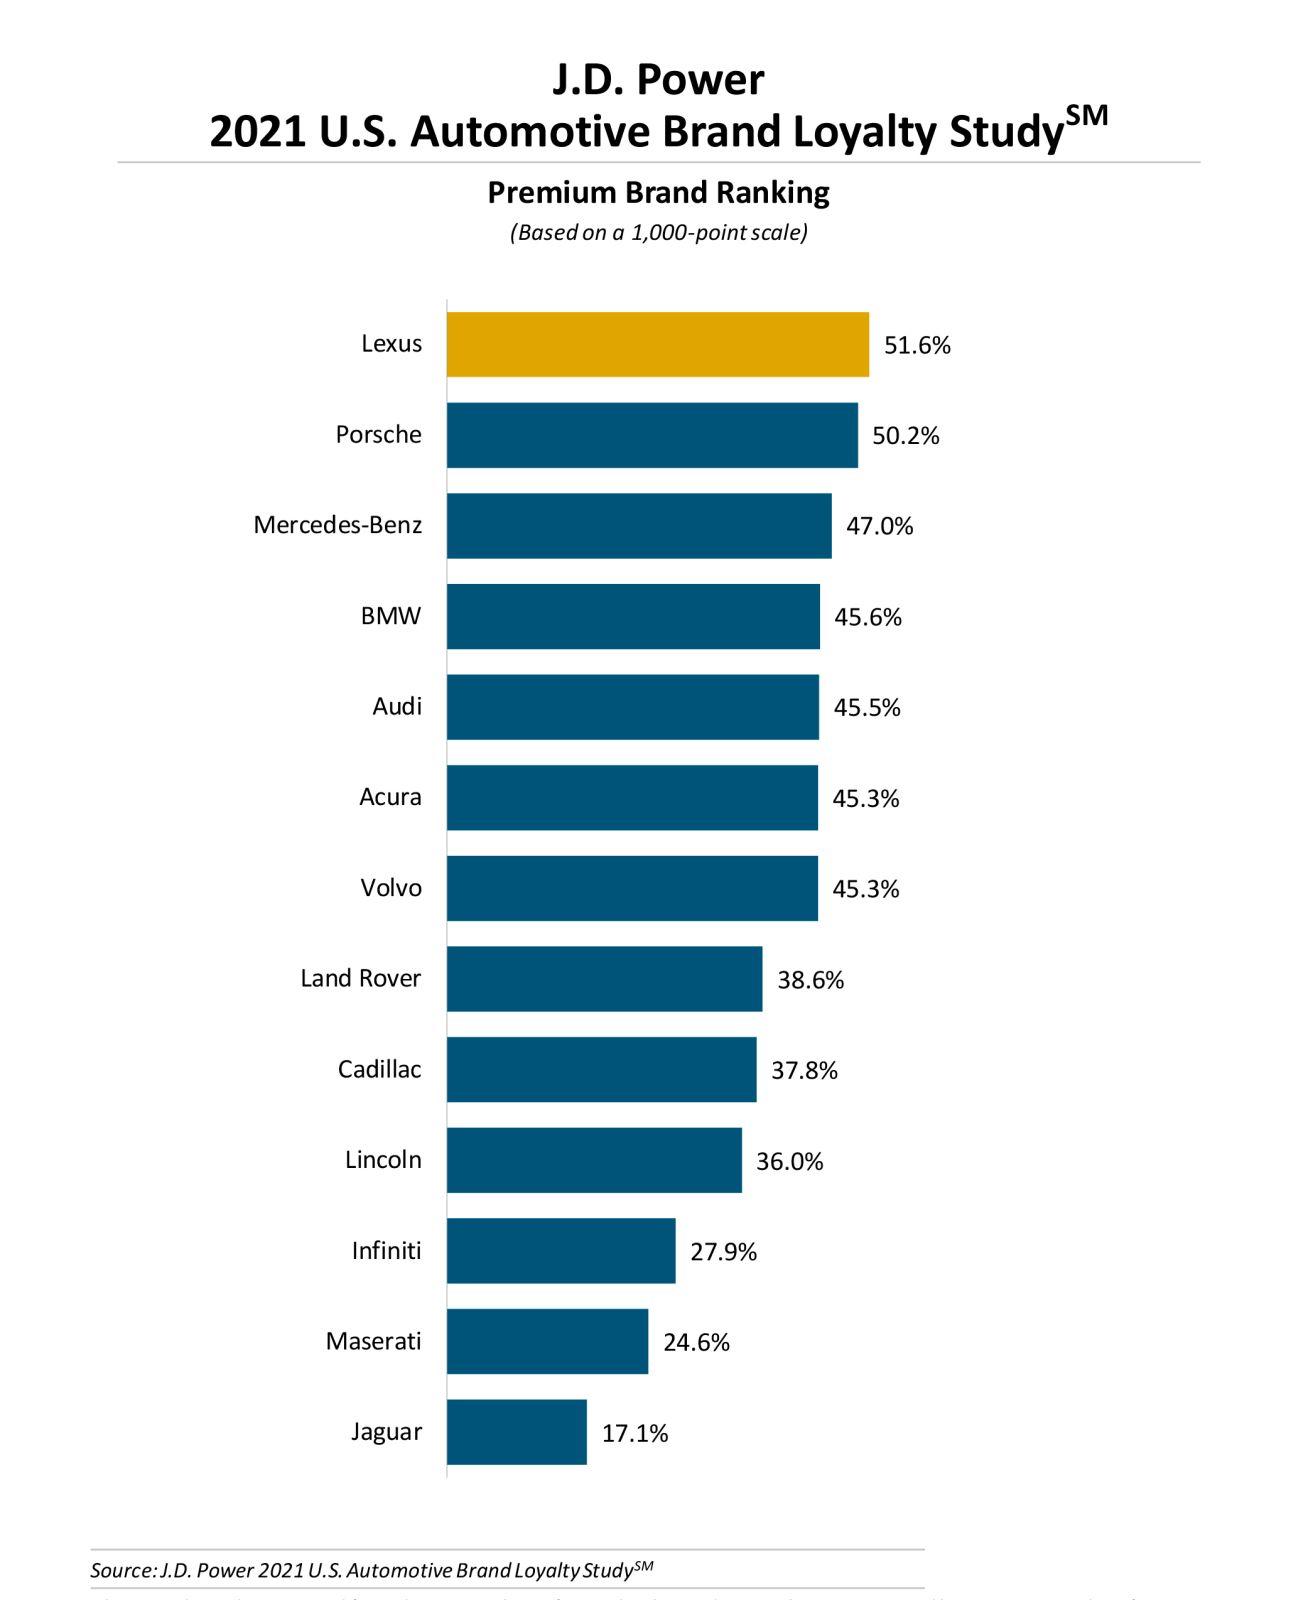 2021_abls_premium_brand_ranking